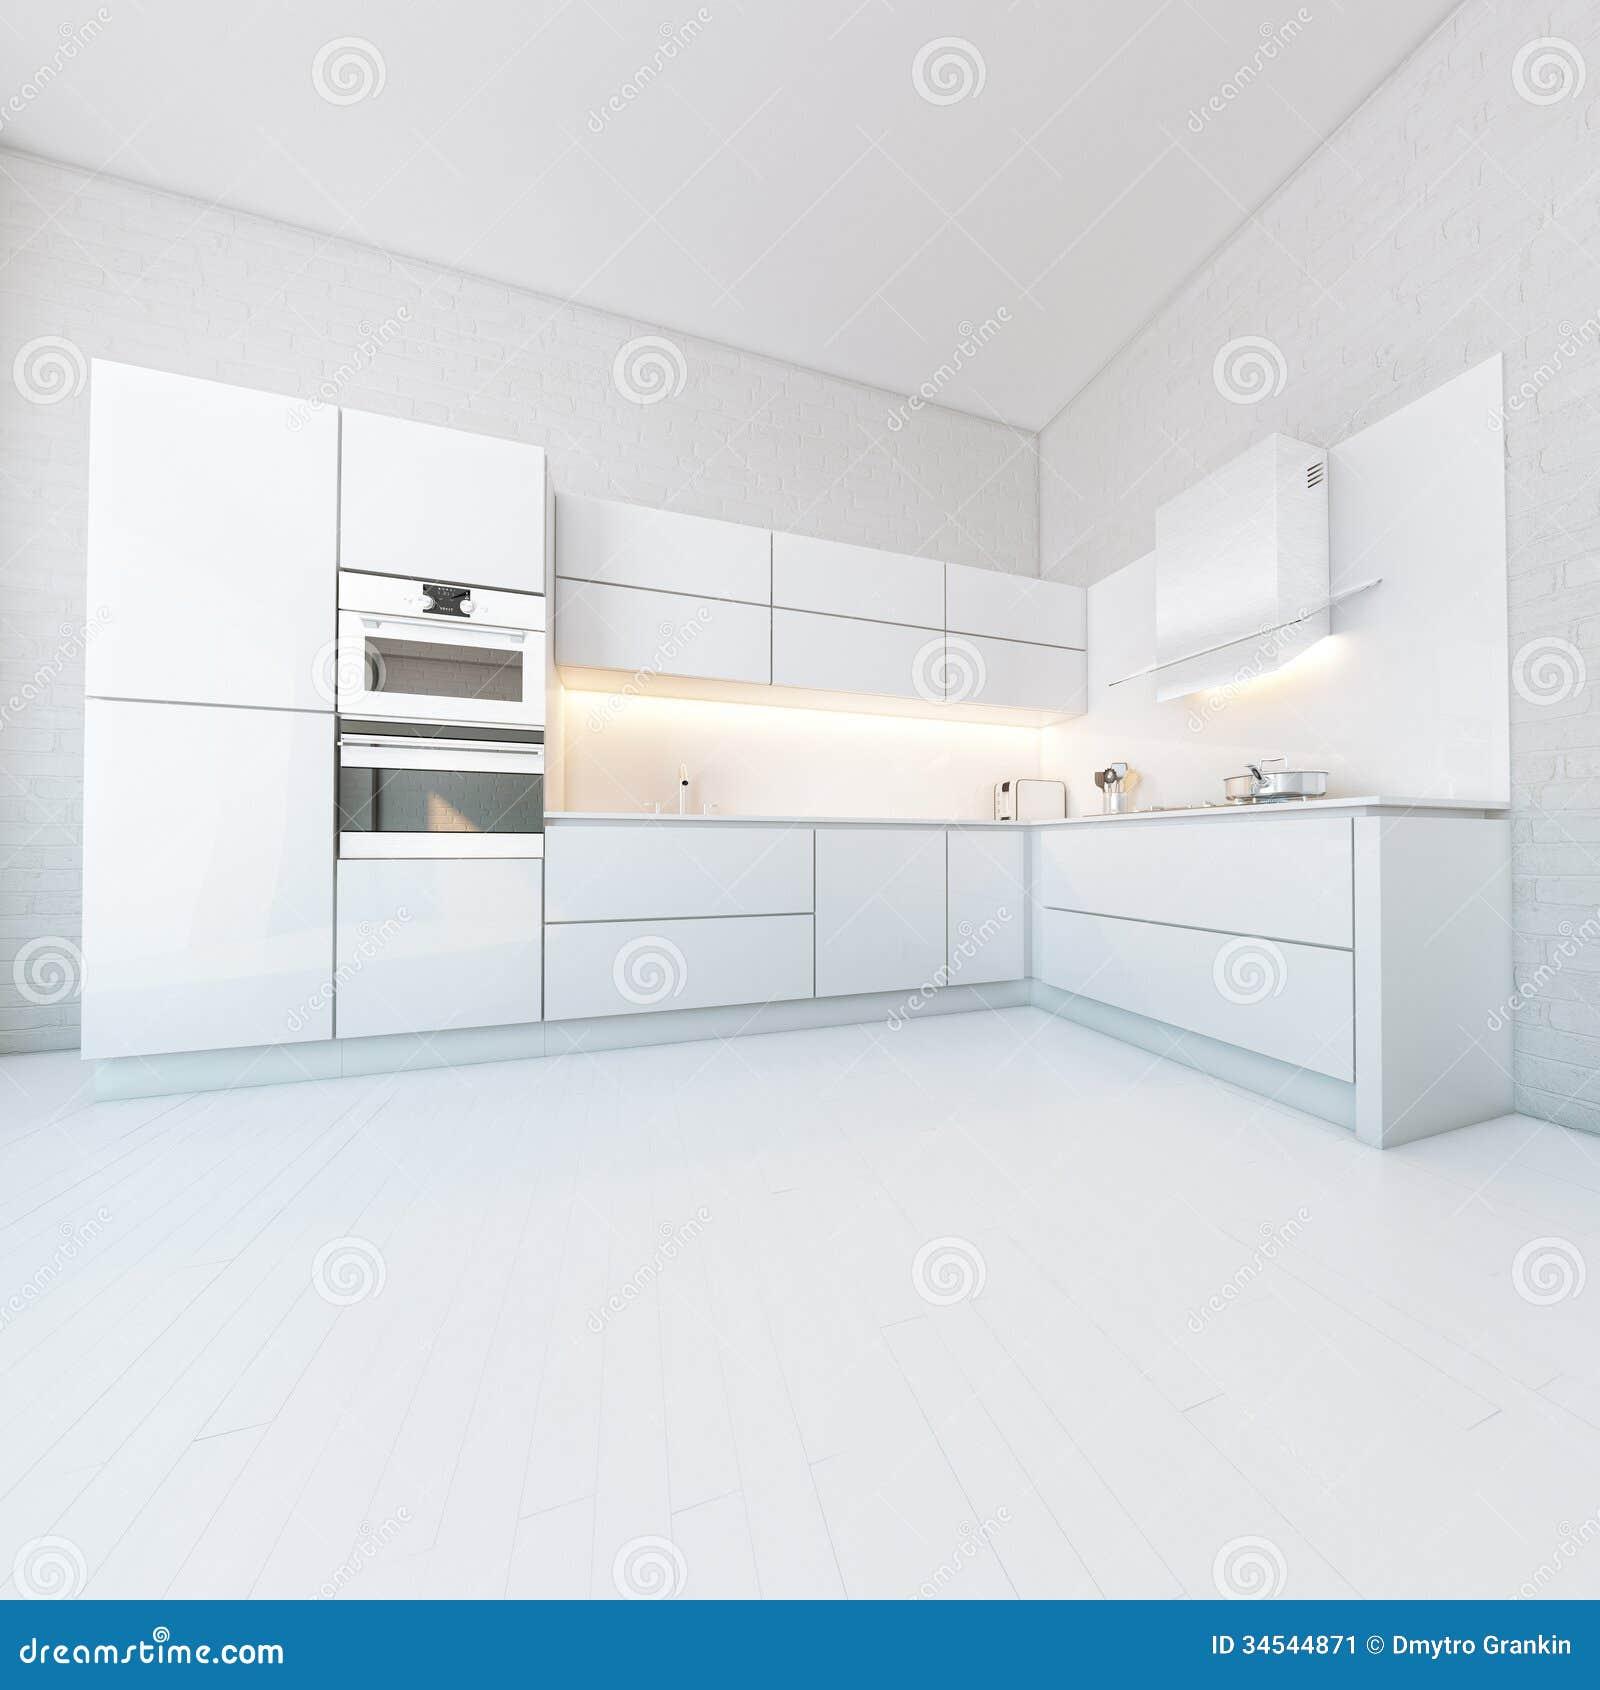 Luxury White Kitchen In Hi Tech Style Stock Illustration